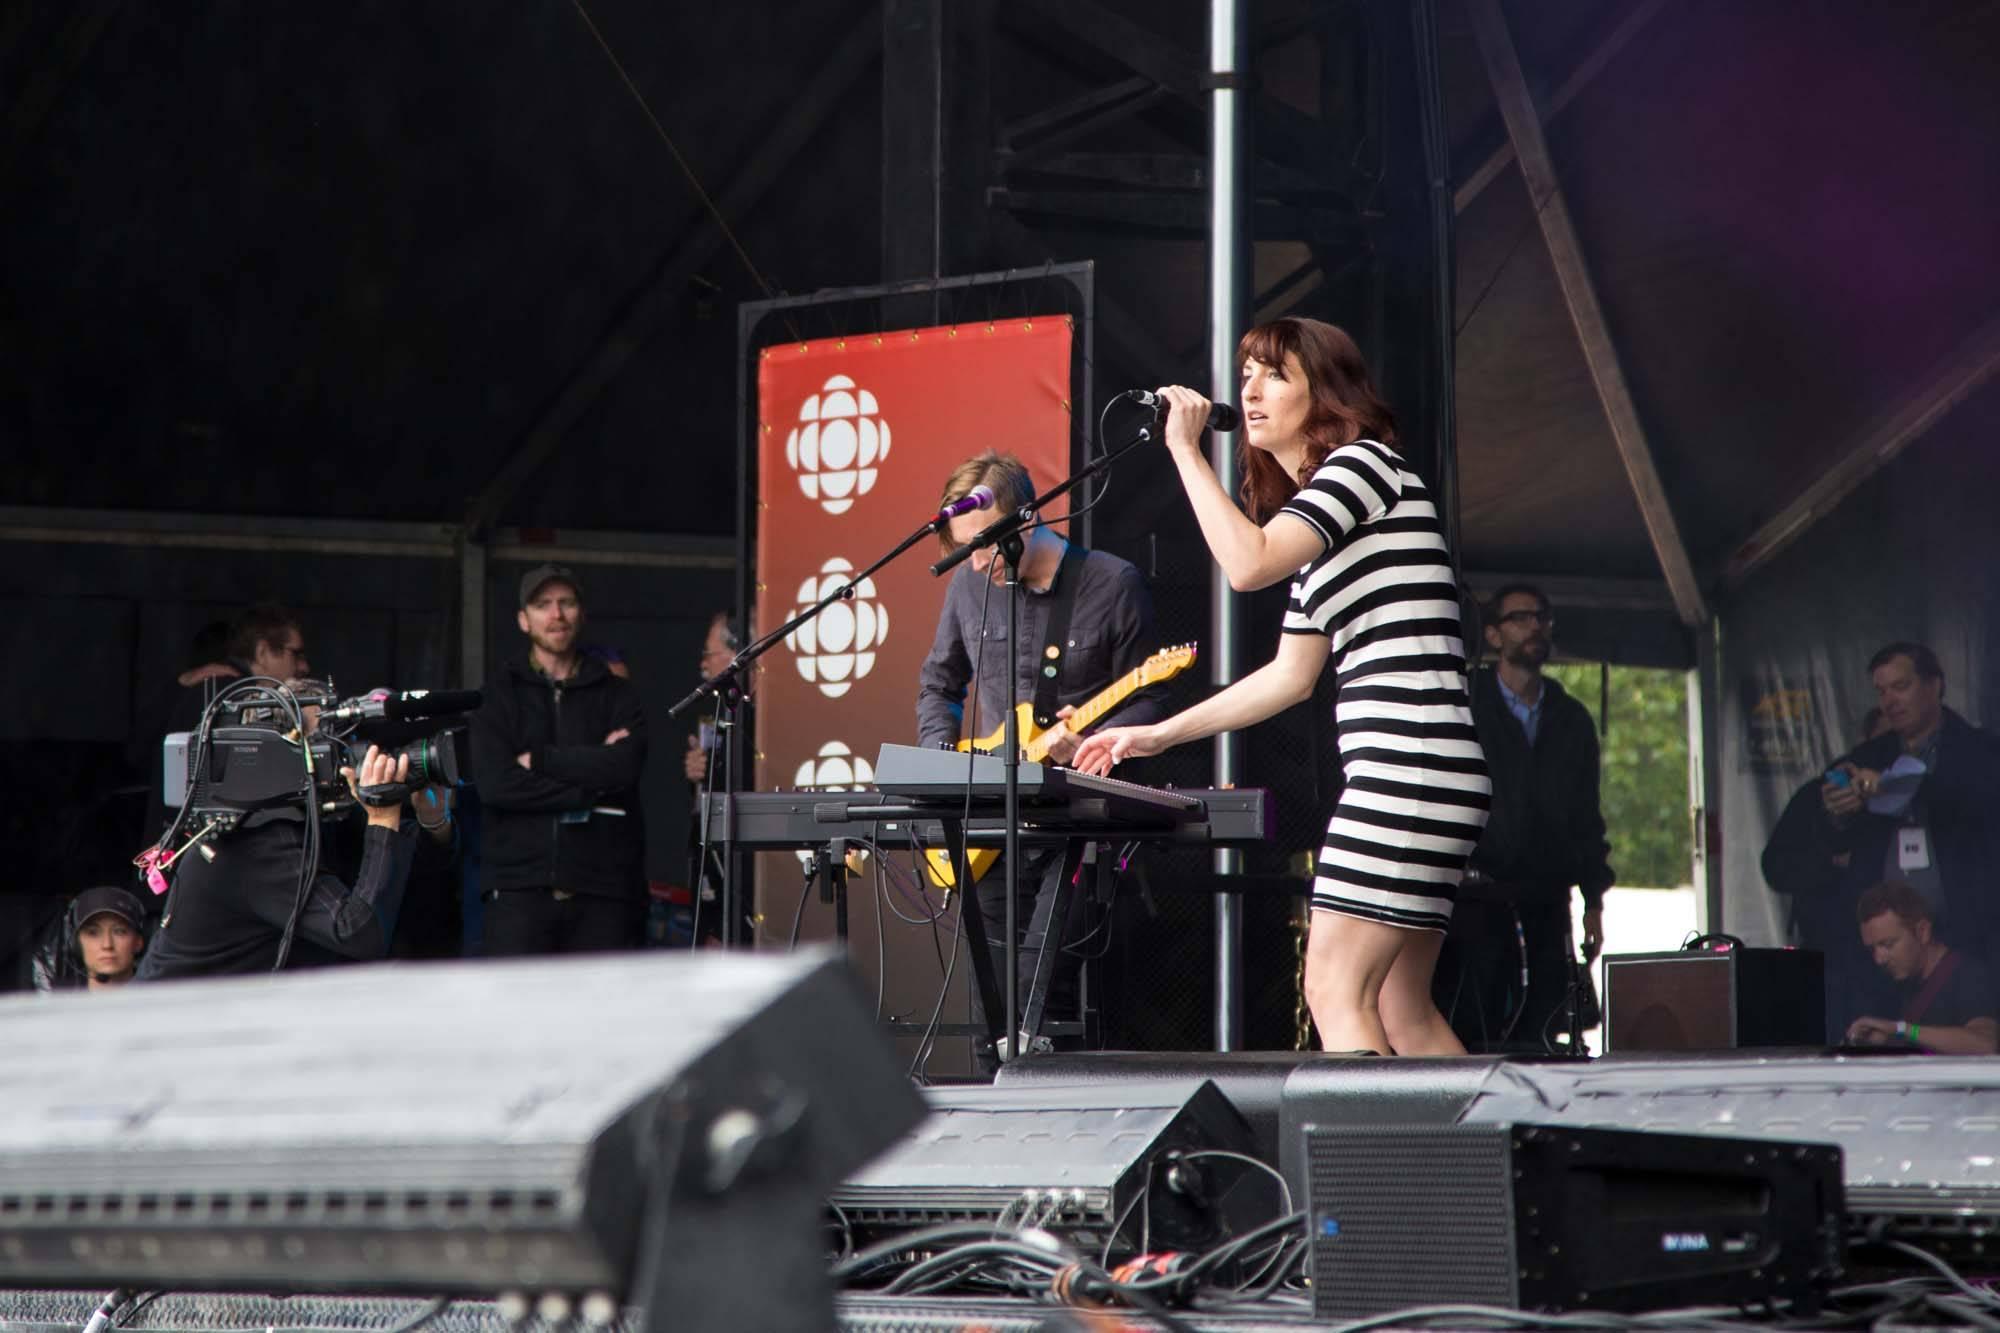 Hannah Georgas at CBC Music Festival June 14 2014